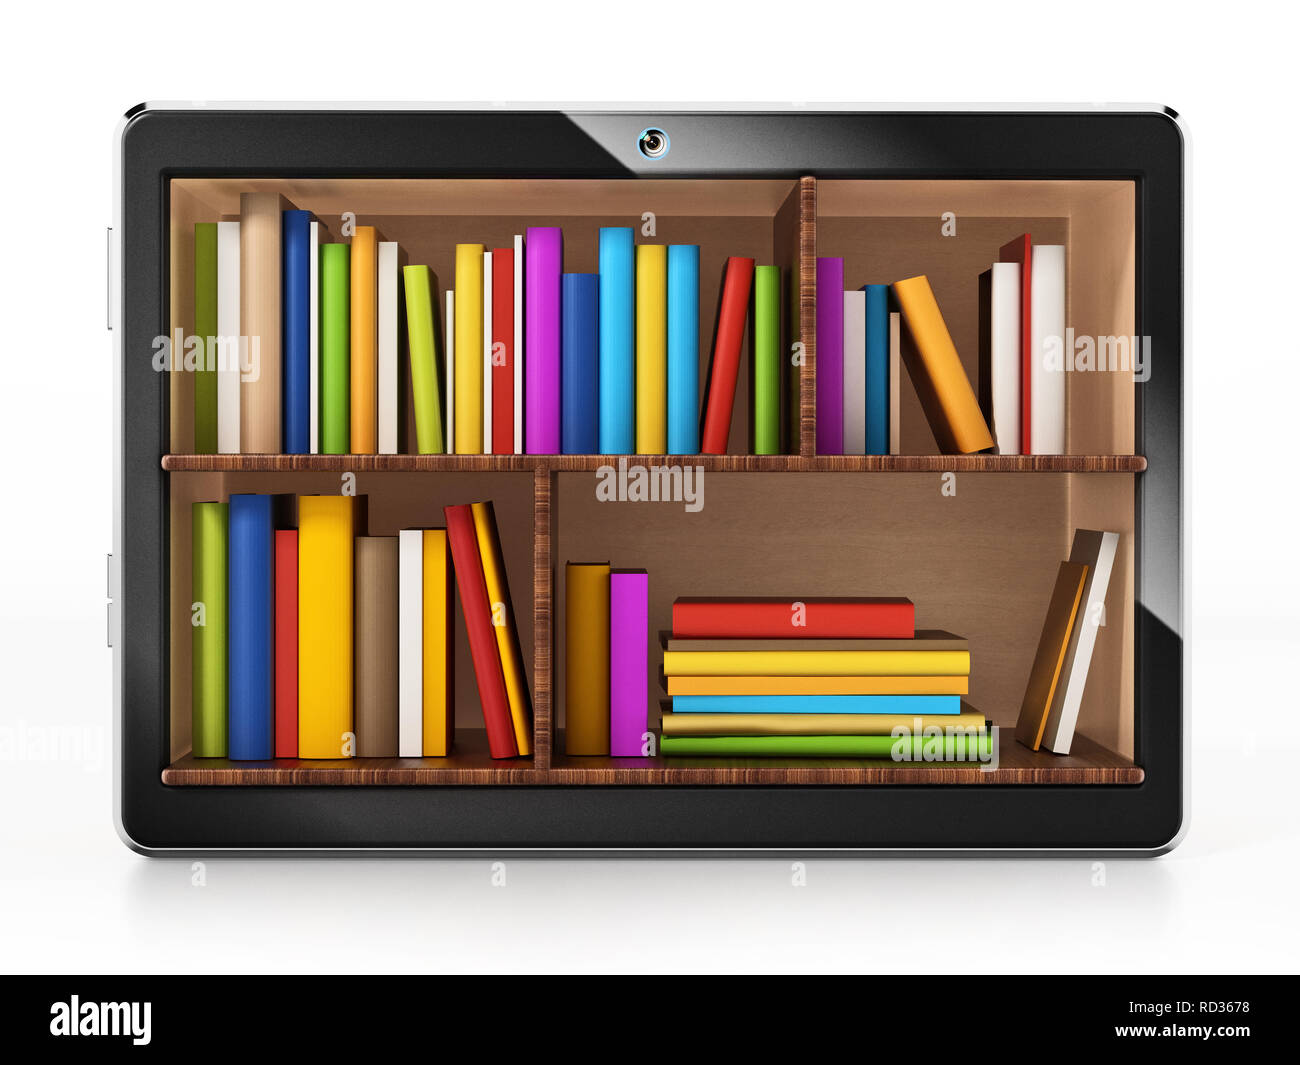 Books inside generic tablet PC. 3D illustration. - Stock Image